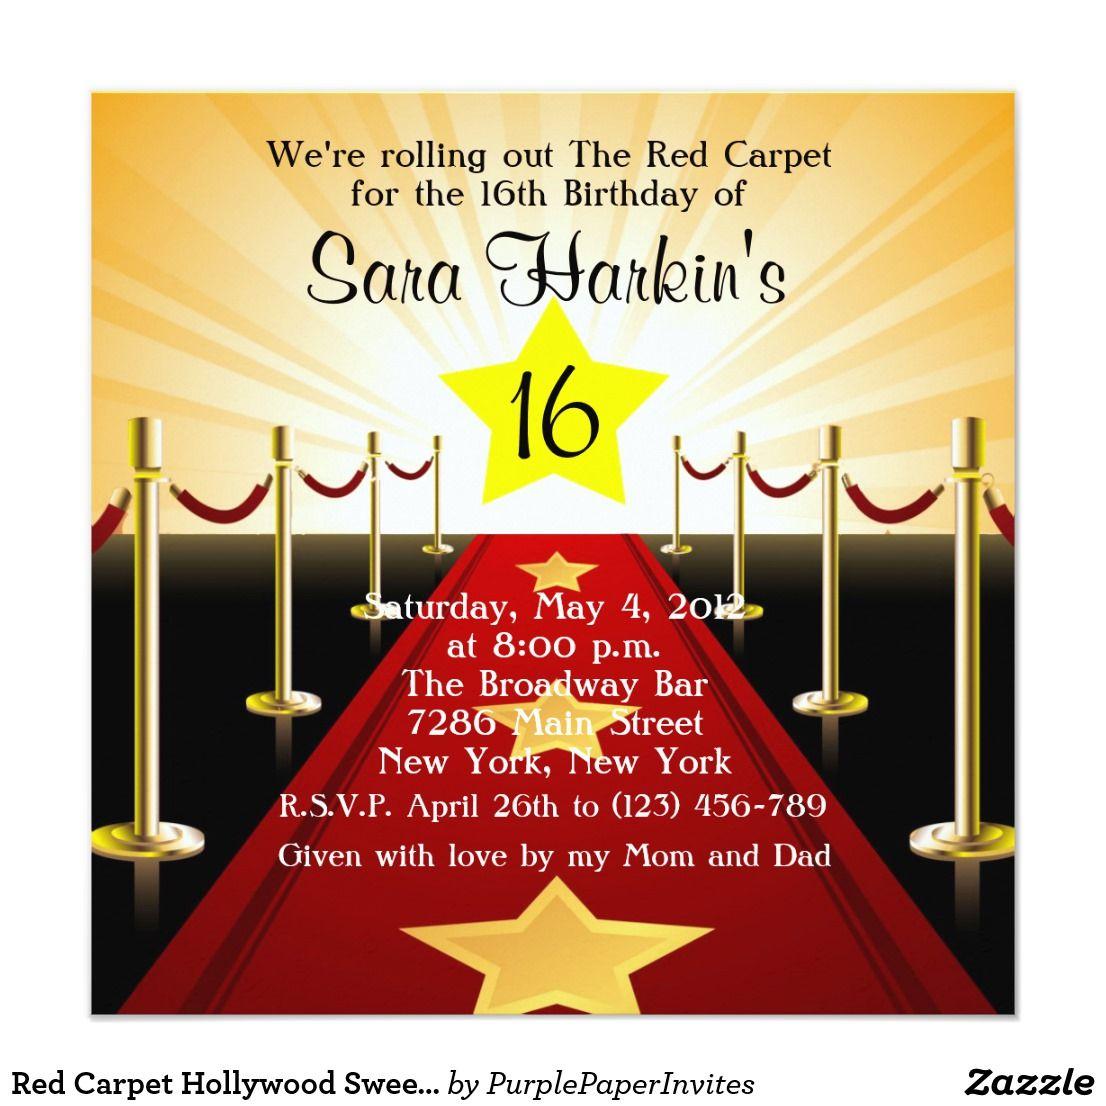 Red Carpet Hollywood Sweet 16 Birthday Invite | Sweet 16 birthday ...